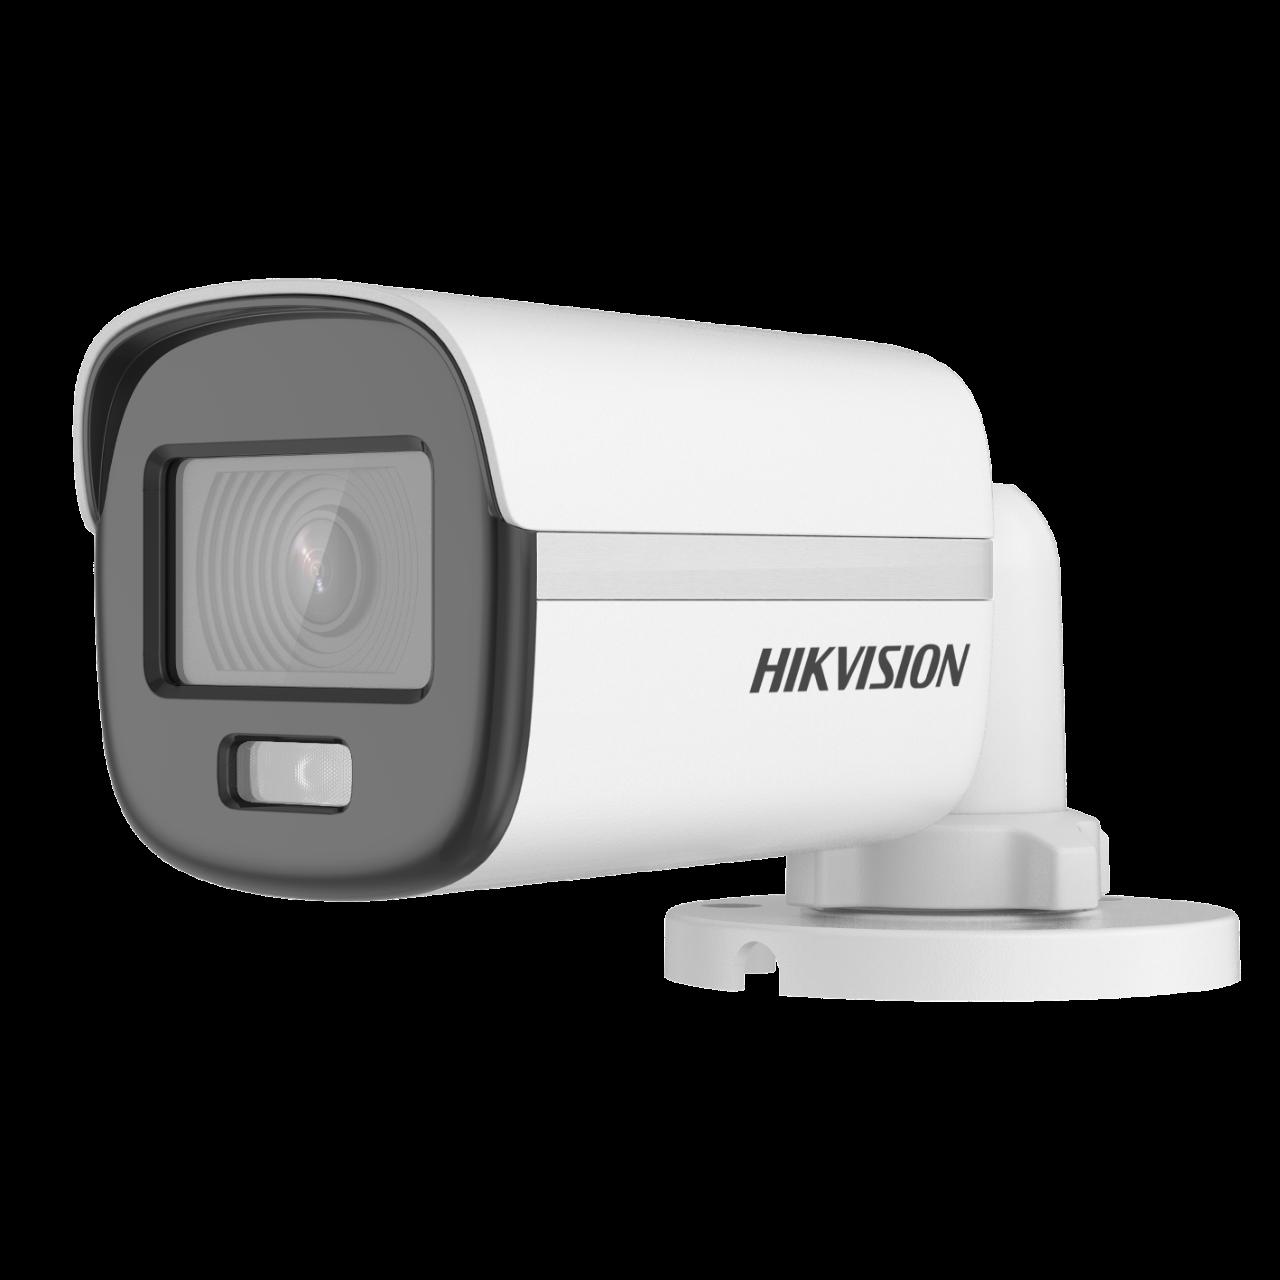 DS-2CE10DF0T-F | ColorVu Series | Turbo HD | Hikvision | Hikvision